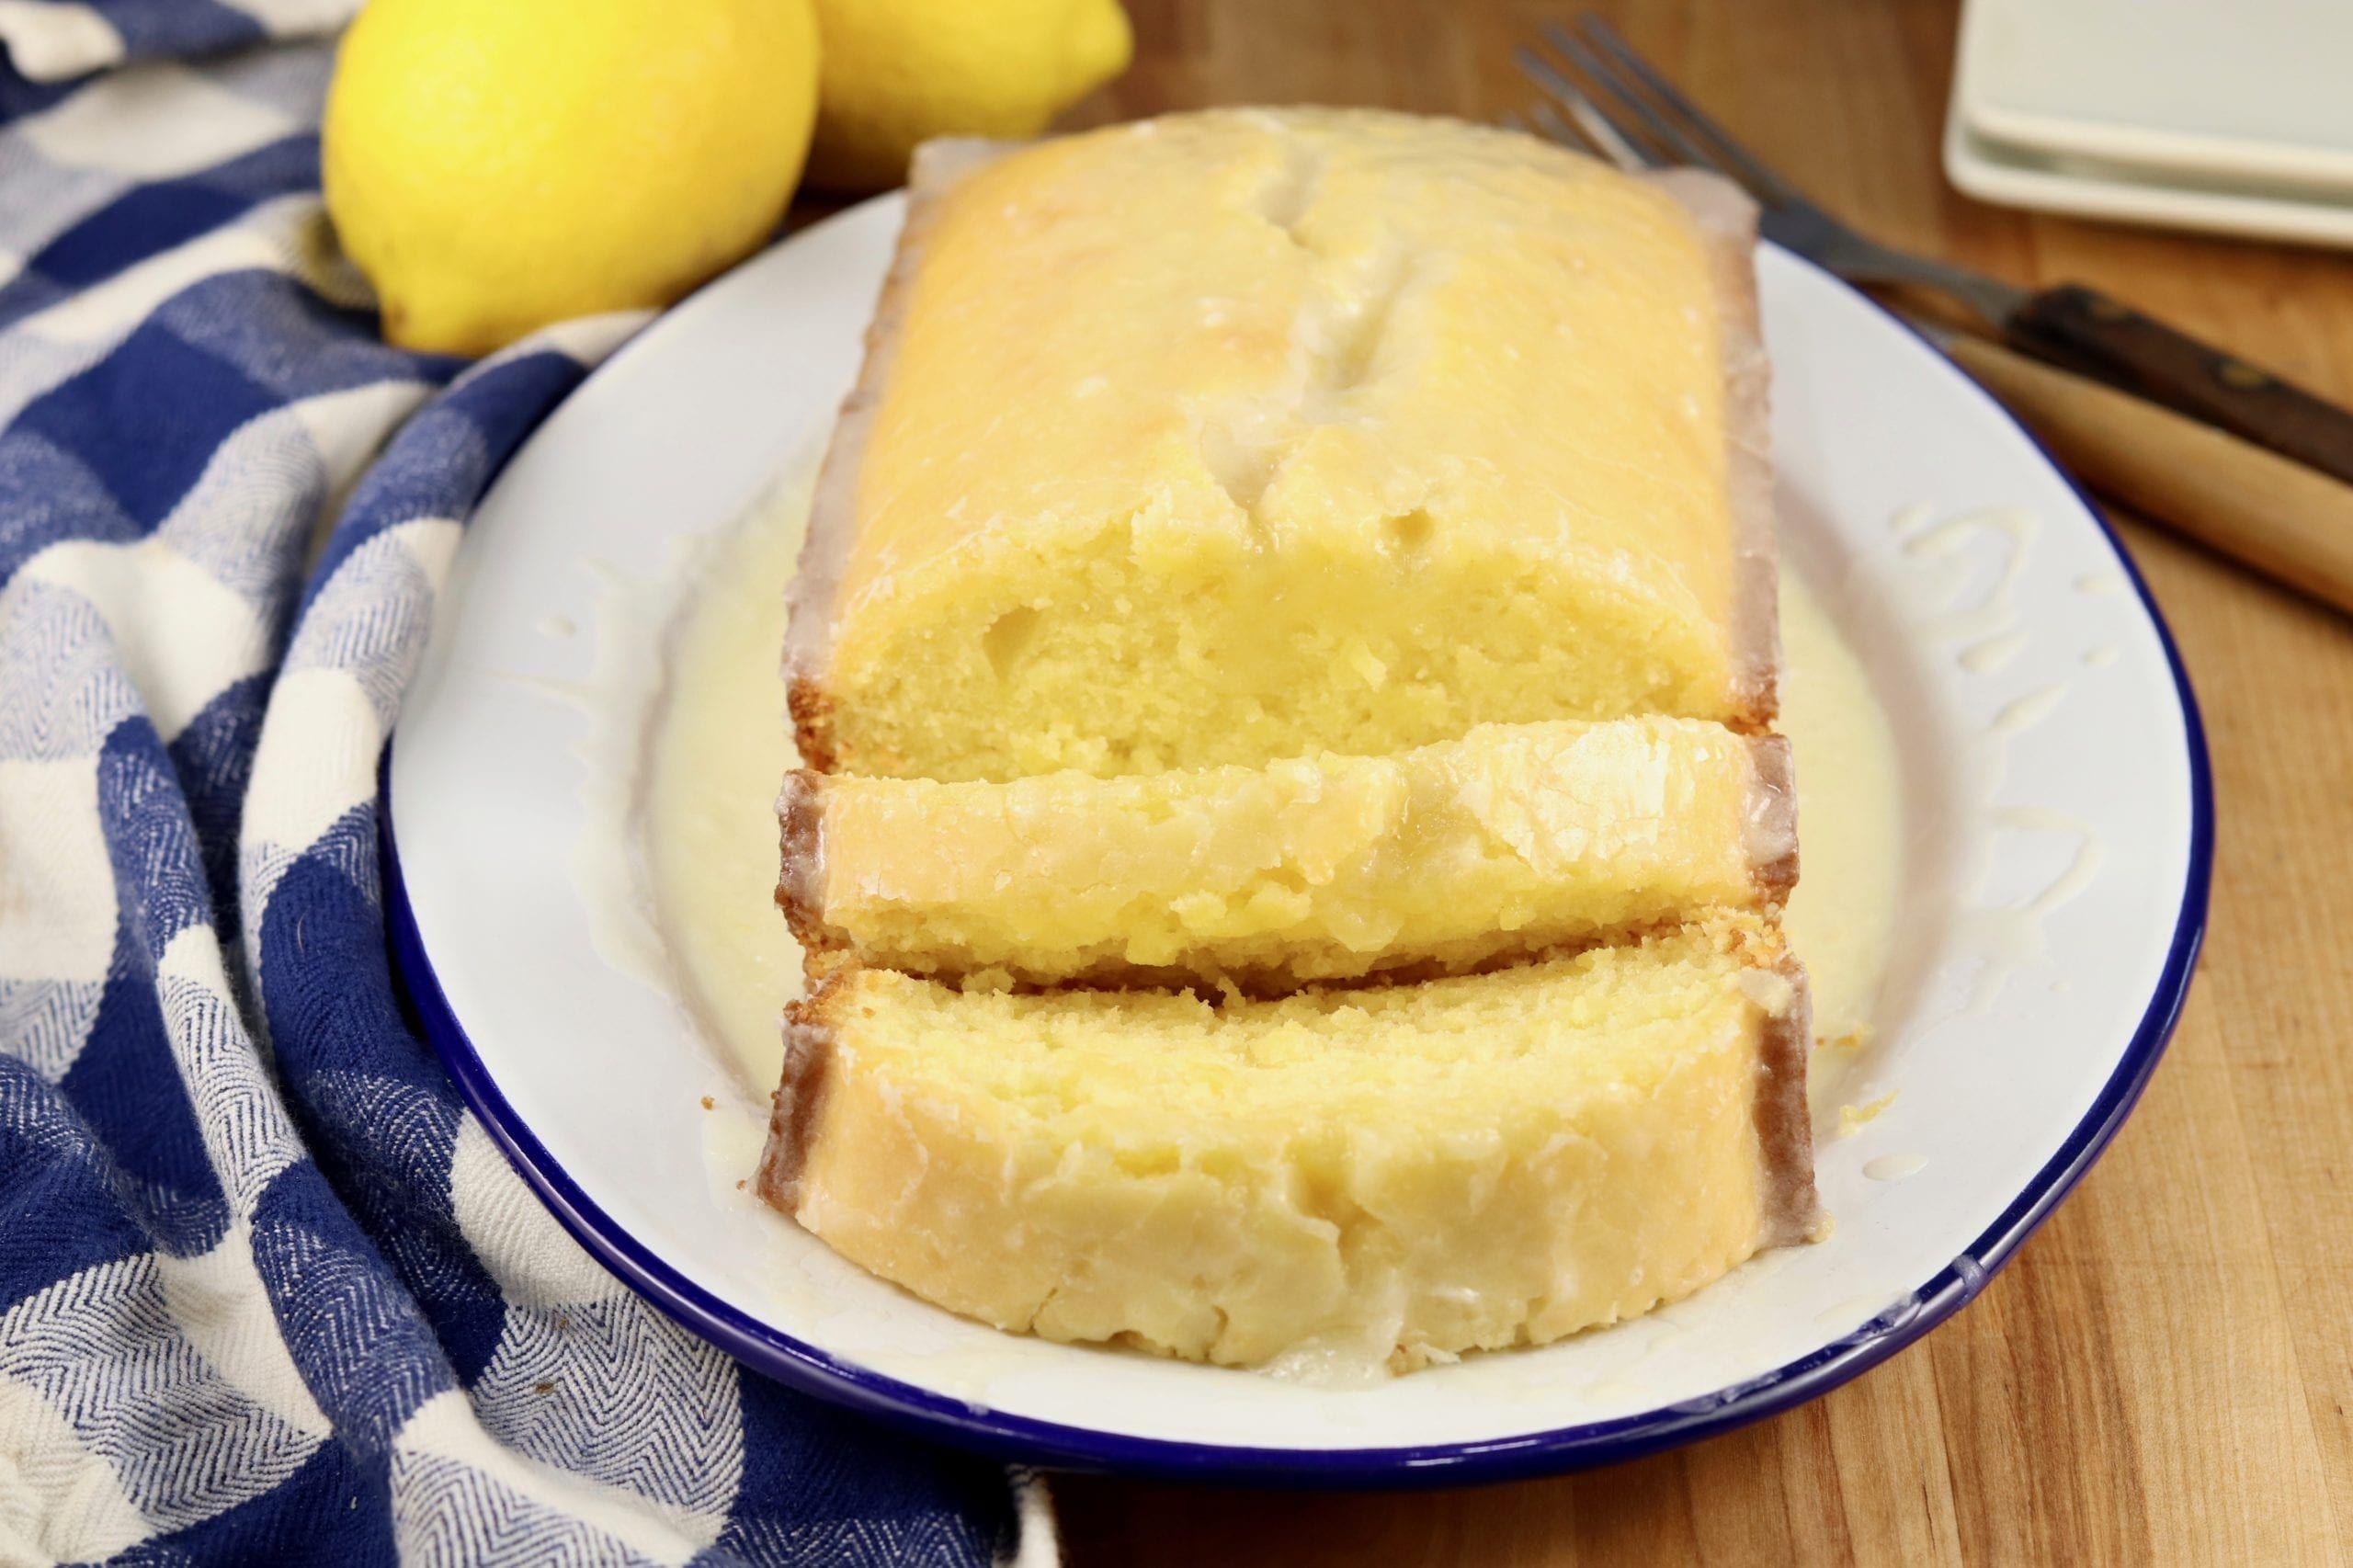 Lemon Pound Cake With Buttermilk Lemon Glaze Miss In The Kitchen In 2020 Pound Cake Lemon Pound Cake Pound Cake Recipes